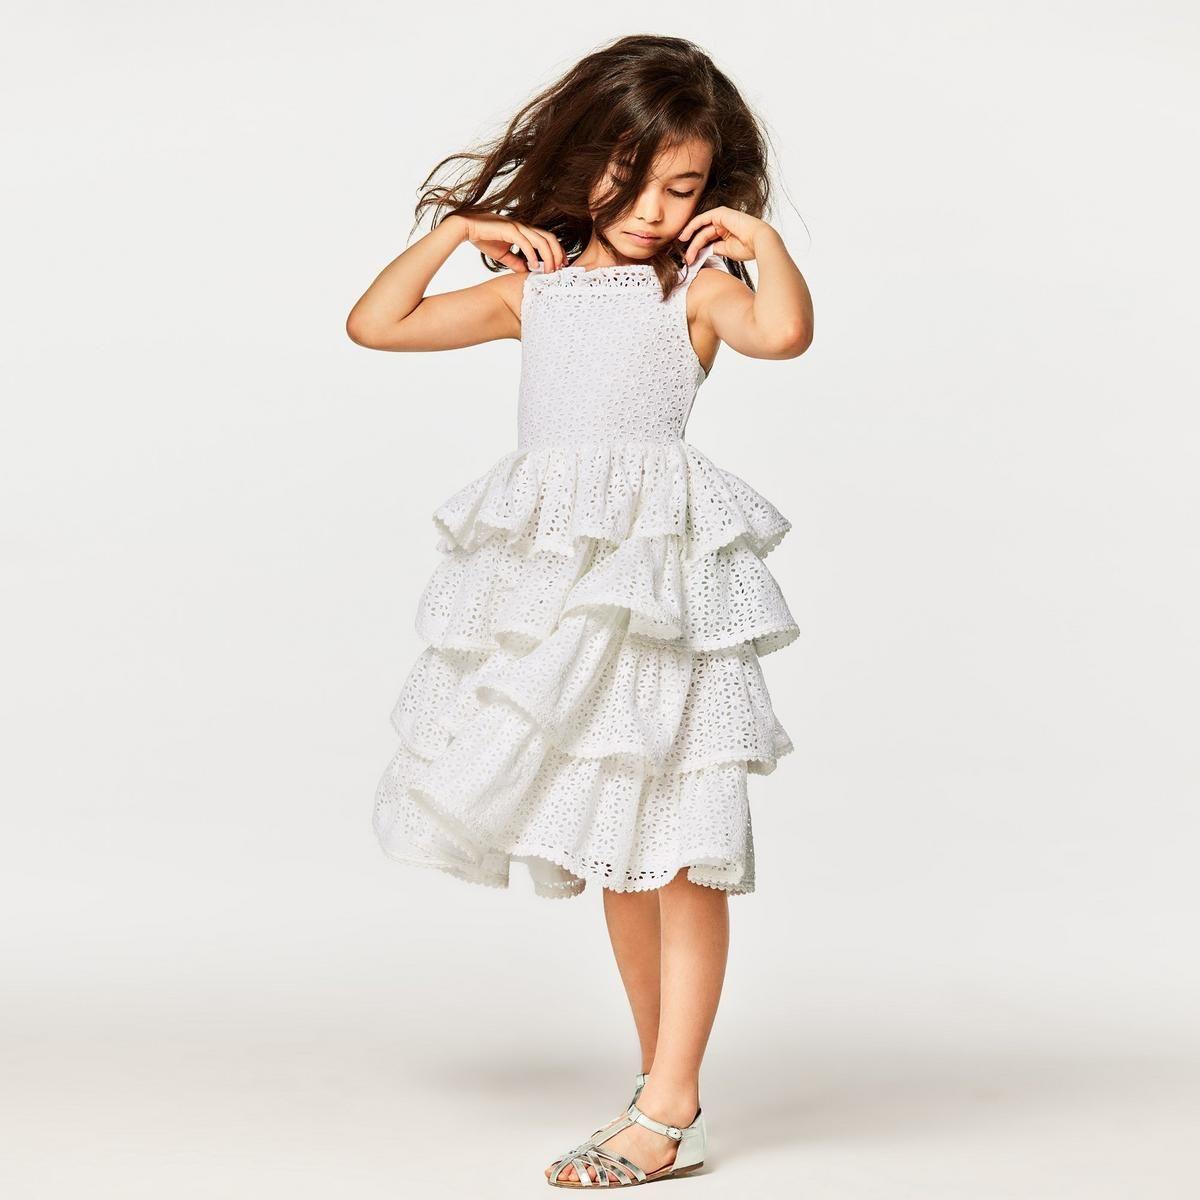 Girl White Tiered Eyelet Dress By Janie And Jack Dresses Versatile Dresses Eyelet Dress [ 1200 x 1200 Pixel ]